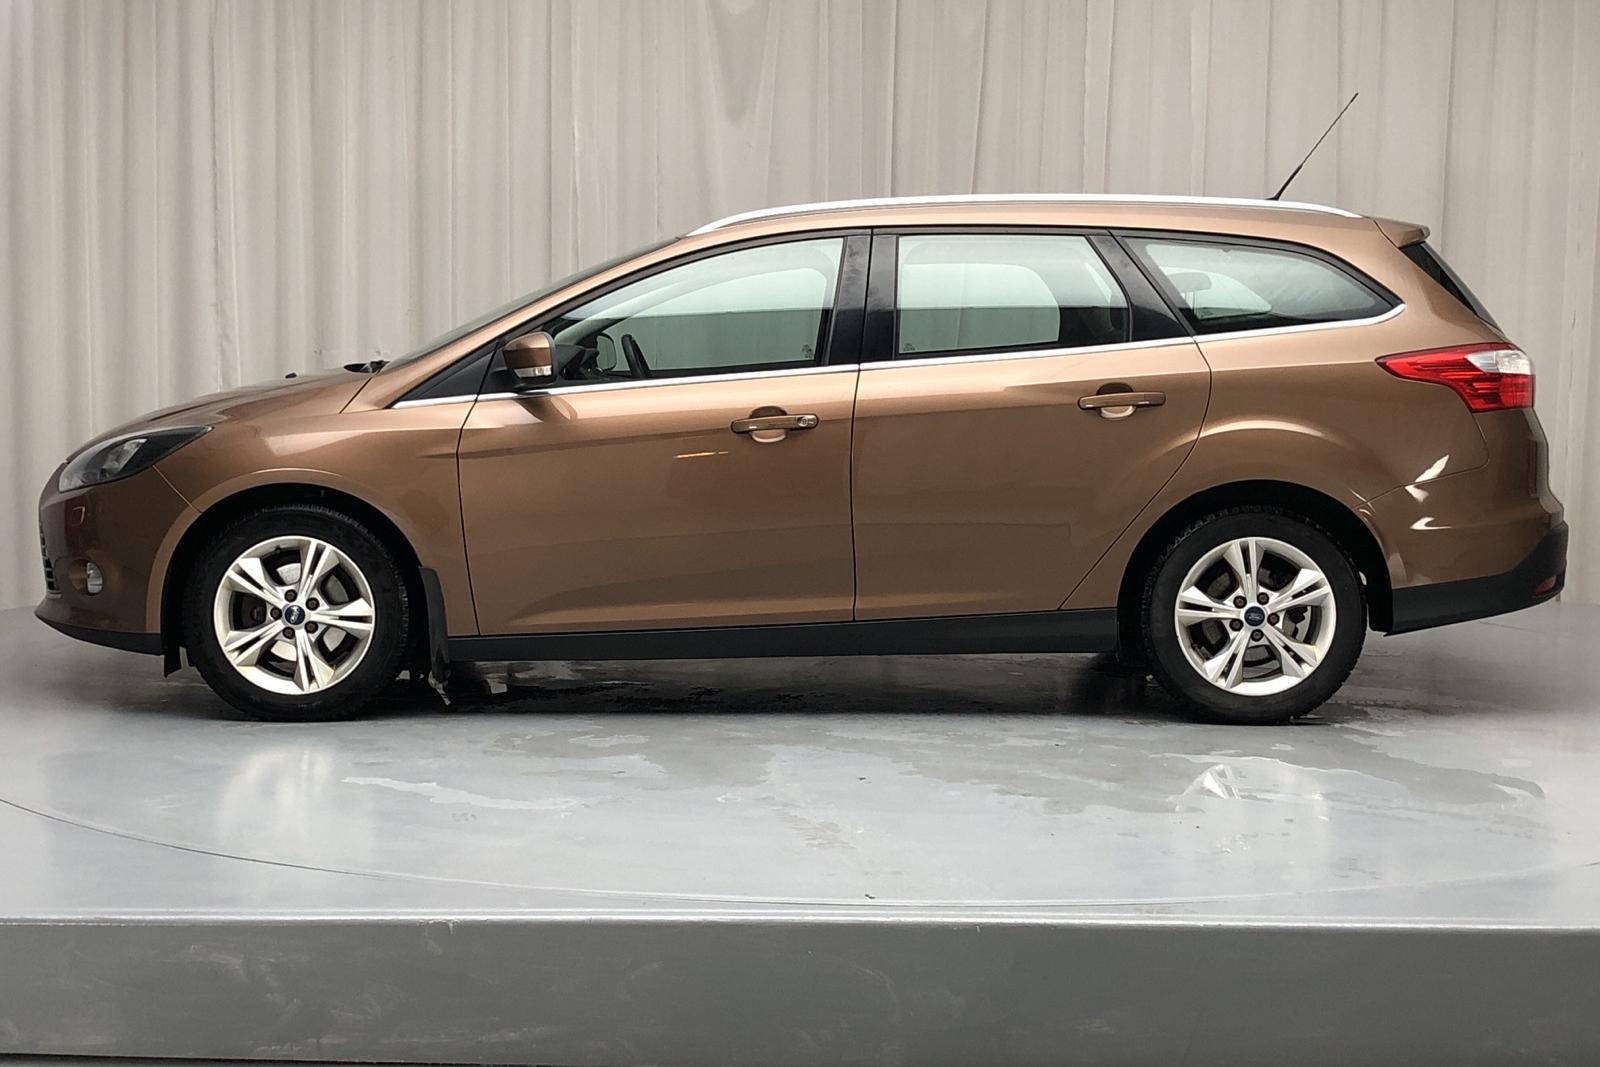 Ford Focus 1.6 TDCi Kombi (115hk) - 14 363 mil - Manuell - brun - 2013